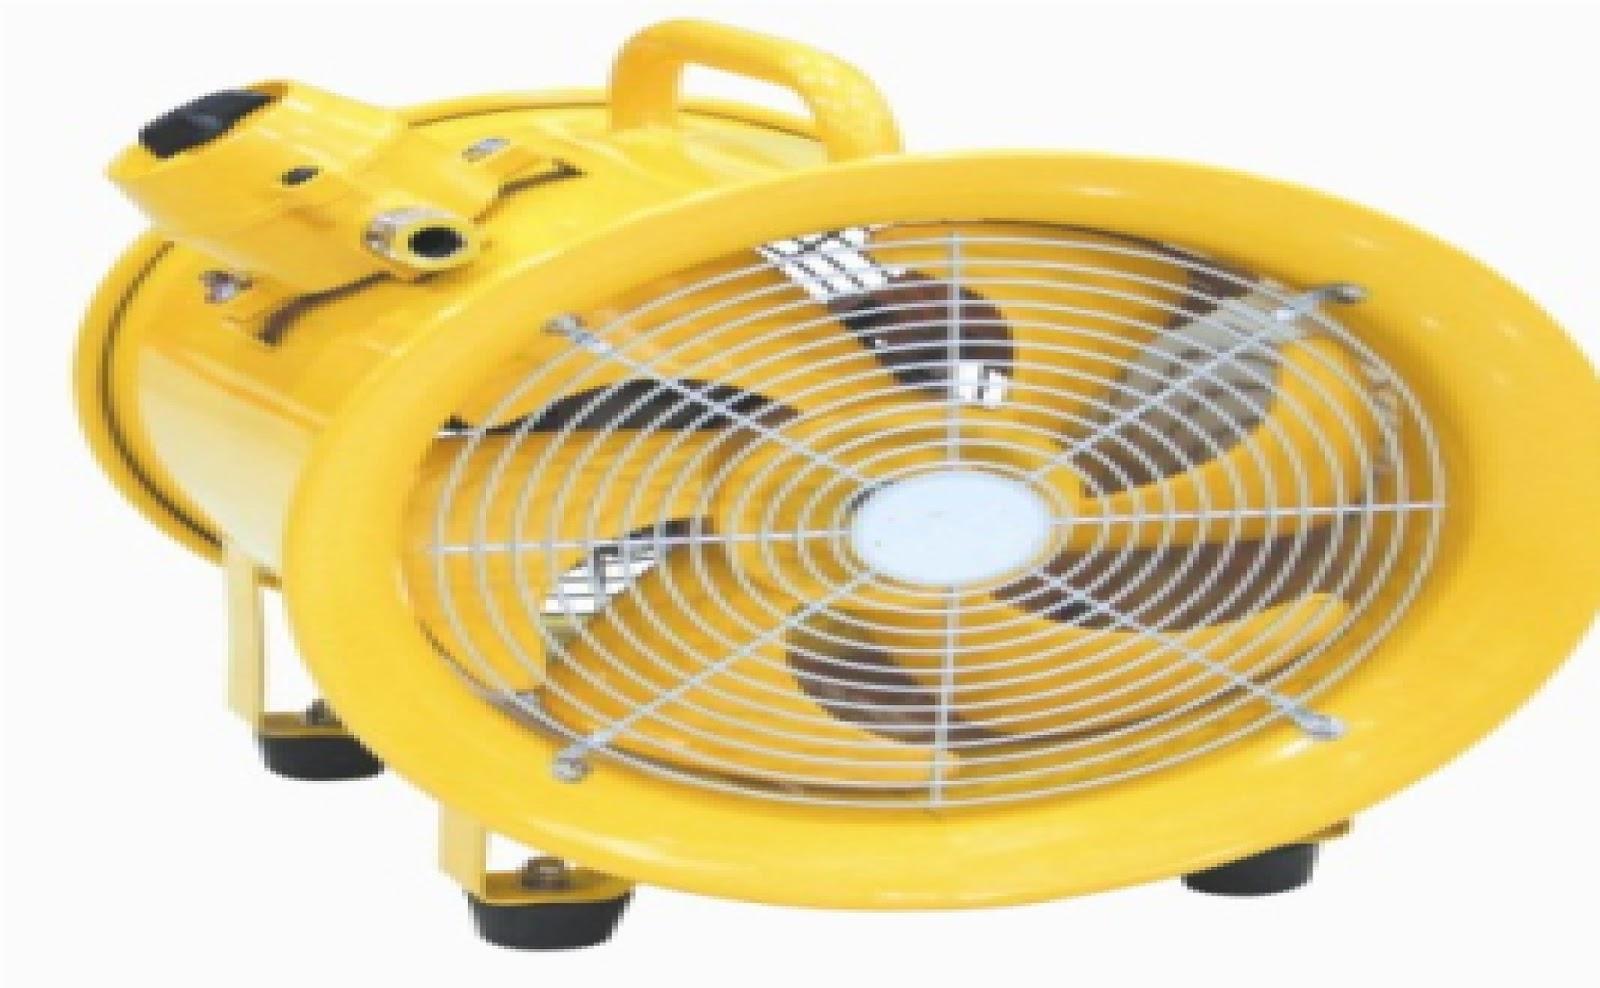 Portable ventilator explosen proof jual blower for Portable dust collector motor blower